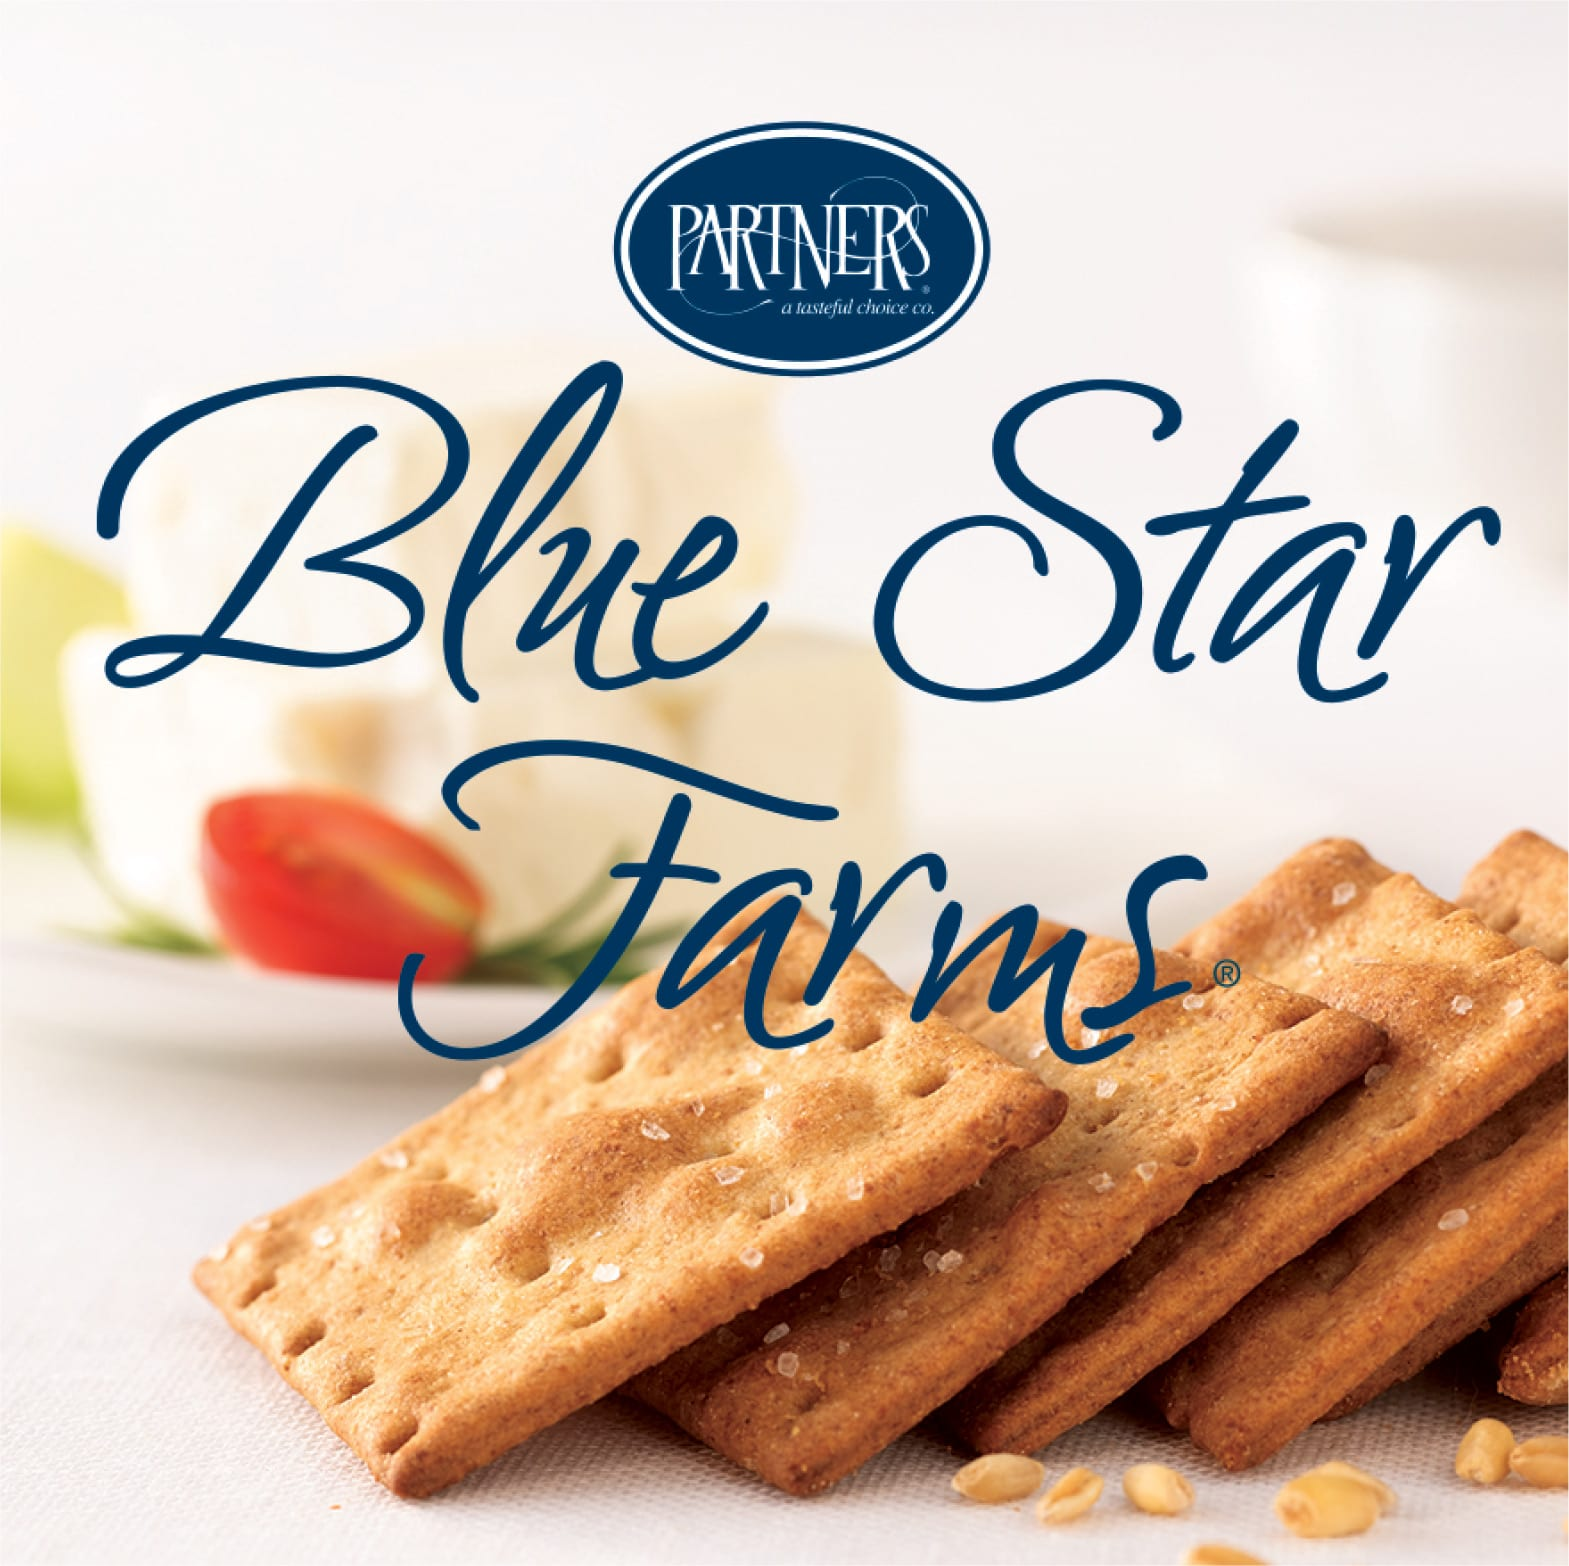 BergmanCramer   Partners Crackers